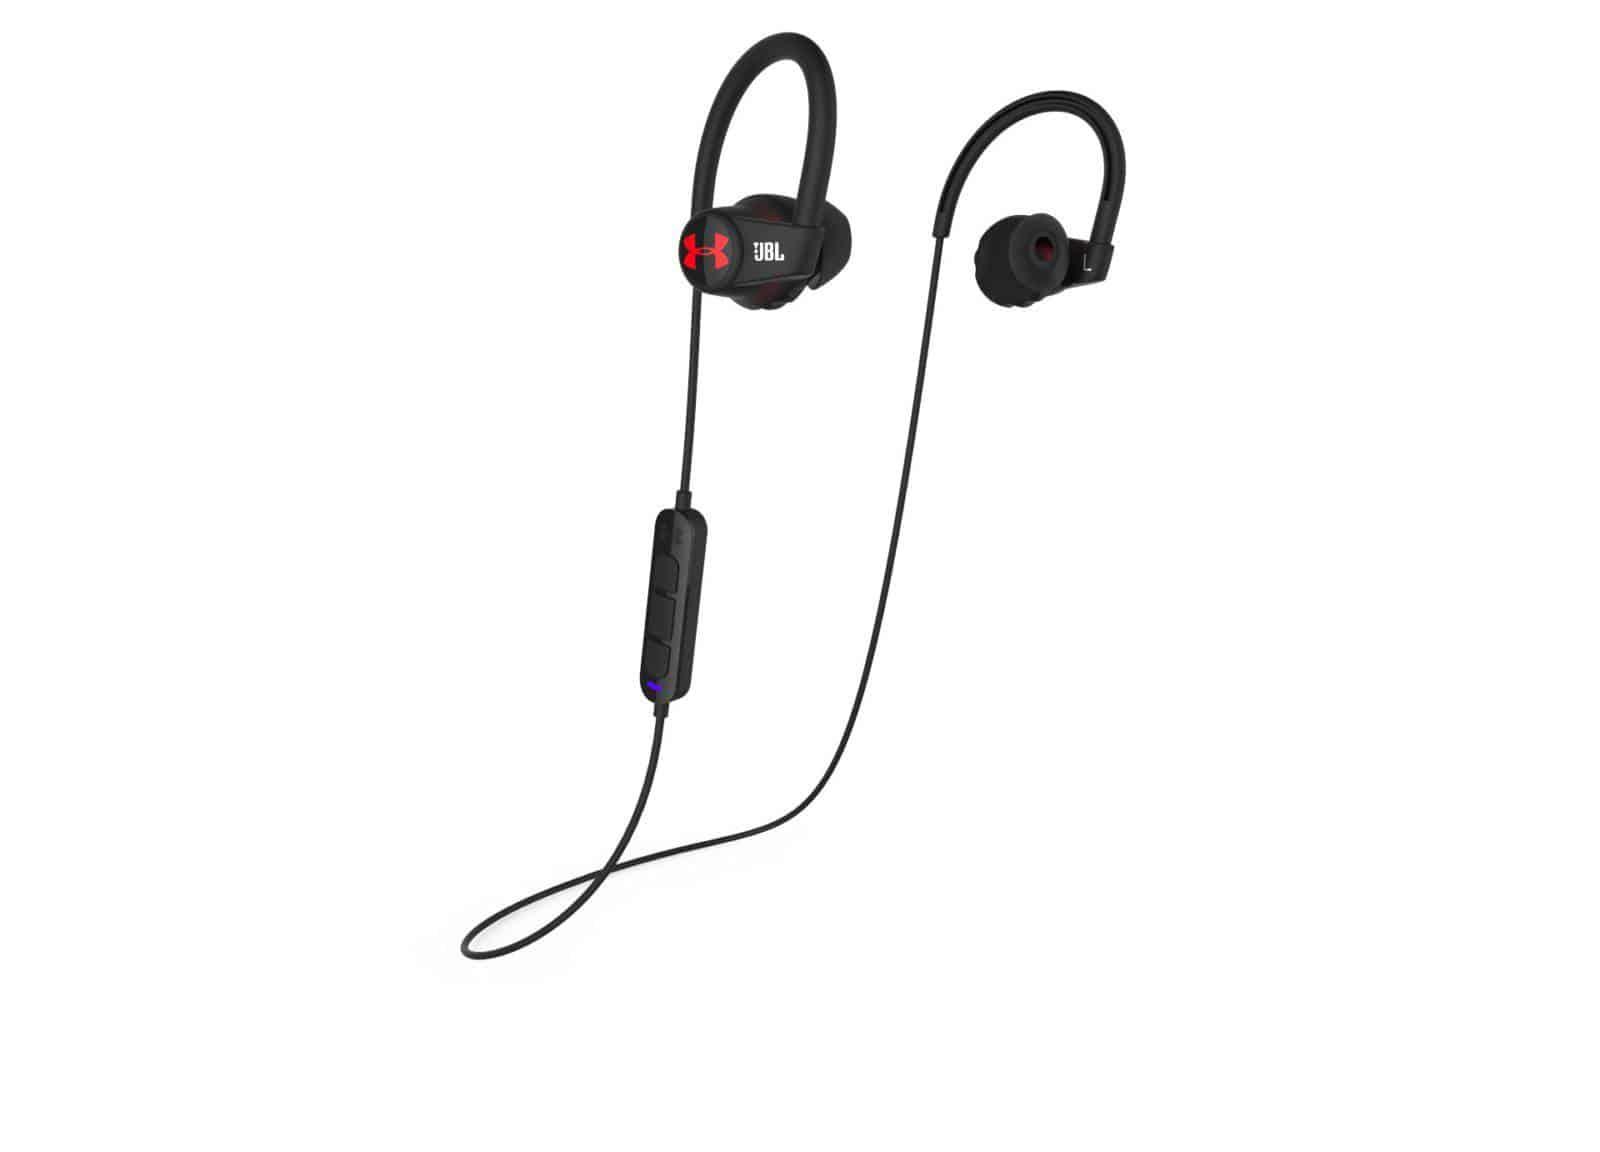 jbl under armour partner to release health focused headphones android. Black Bedroom Furniture Sets. Home Design Ideas